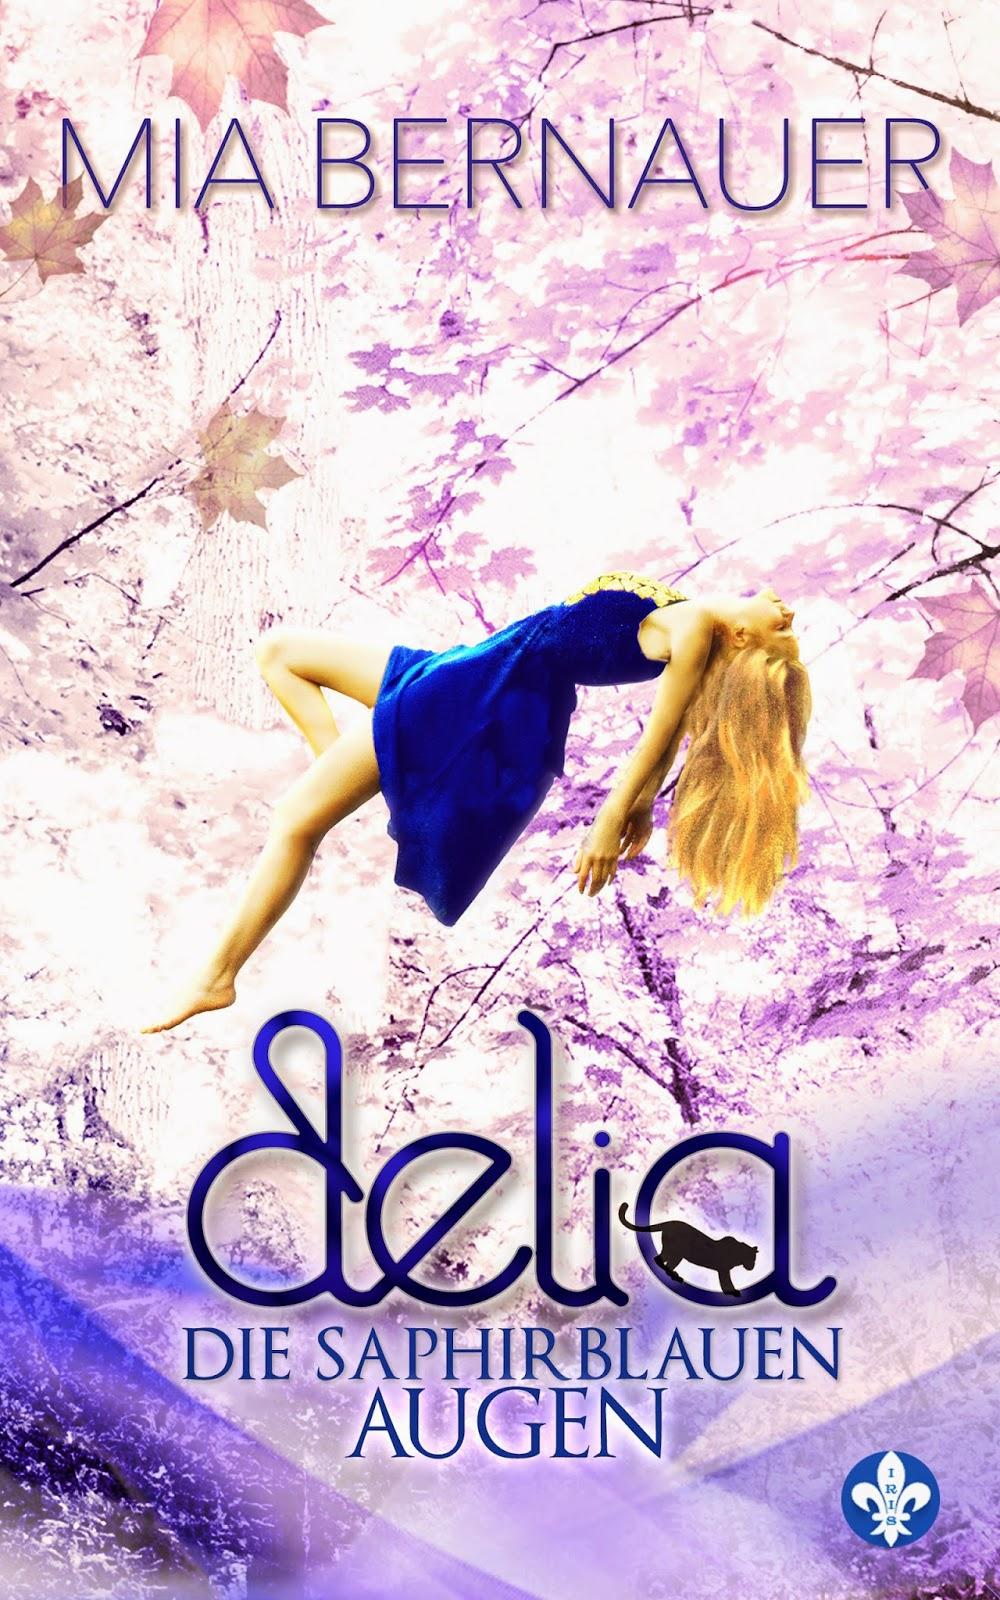 http://www.amazon.de/Delia-Die-saphirblauen-Augen-Trilogie-ebook/dp/B00JYEETAK/ref=sr_1_1?s=digital-text&ie=UTF8&qid=1399123755&sr=1-1&keywords=delia